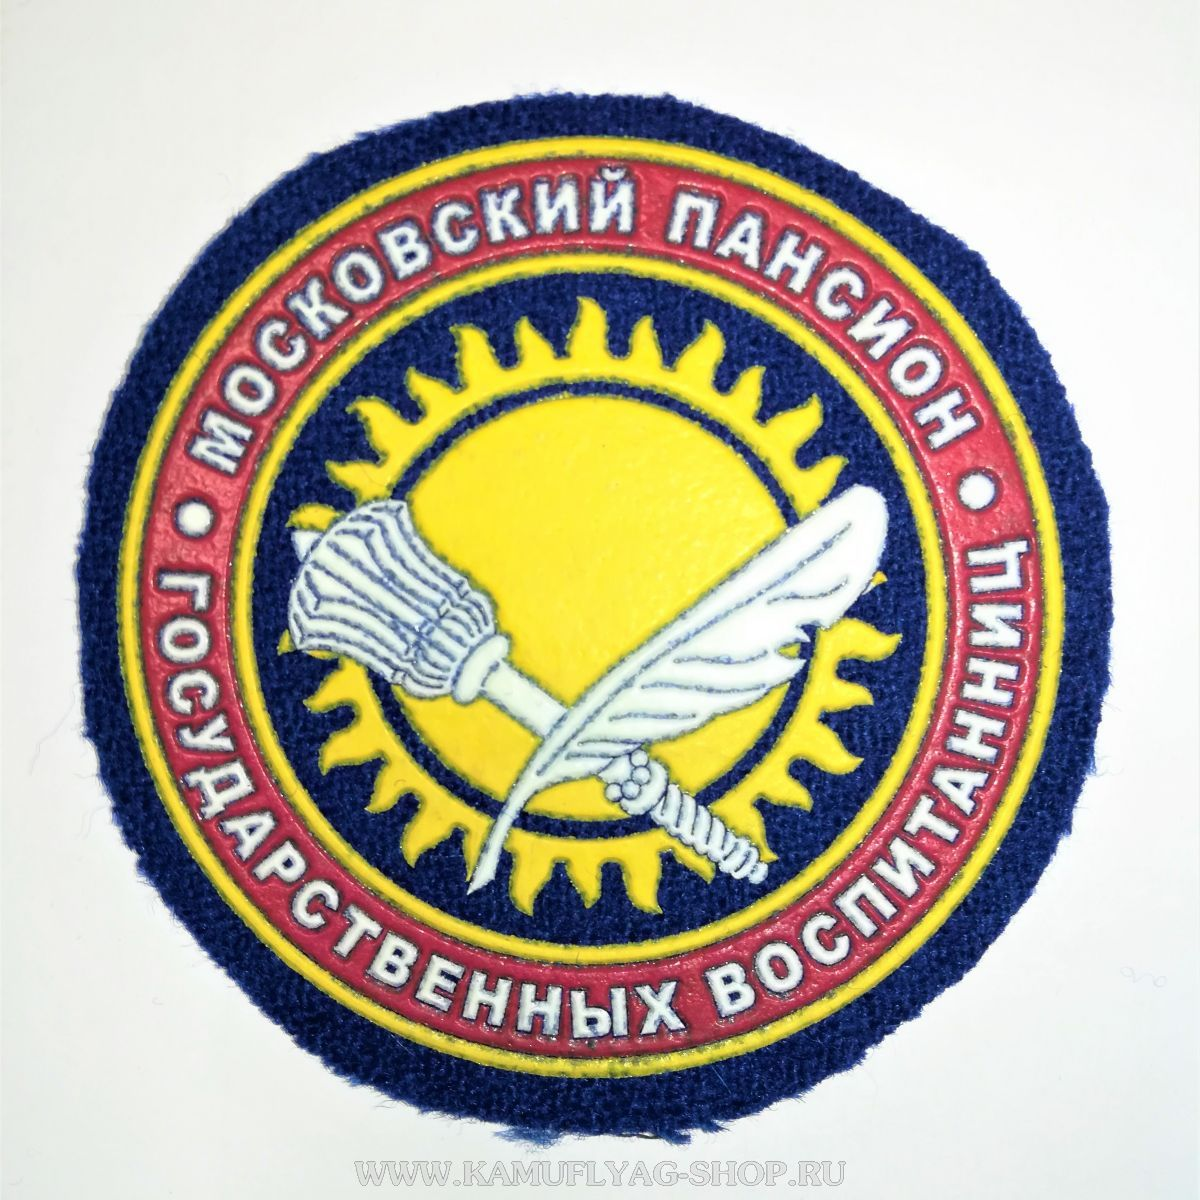 Шеврон Пансион Госуд. воспитанниц, пластизоль